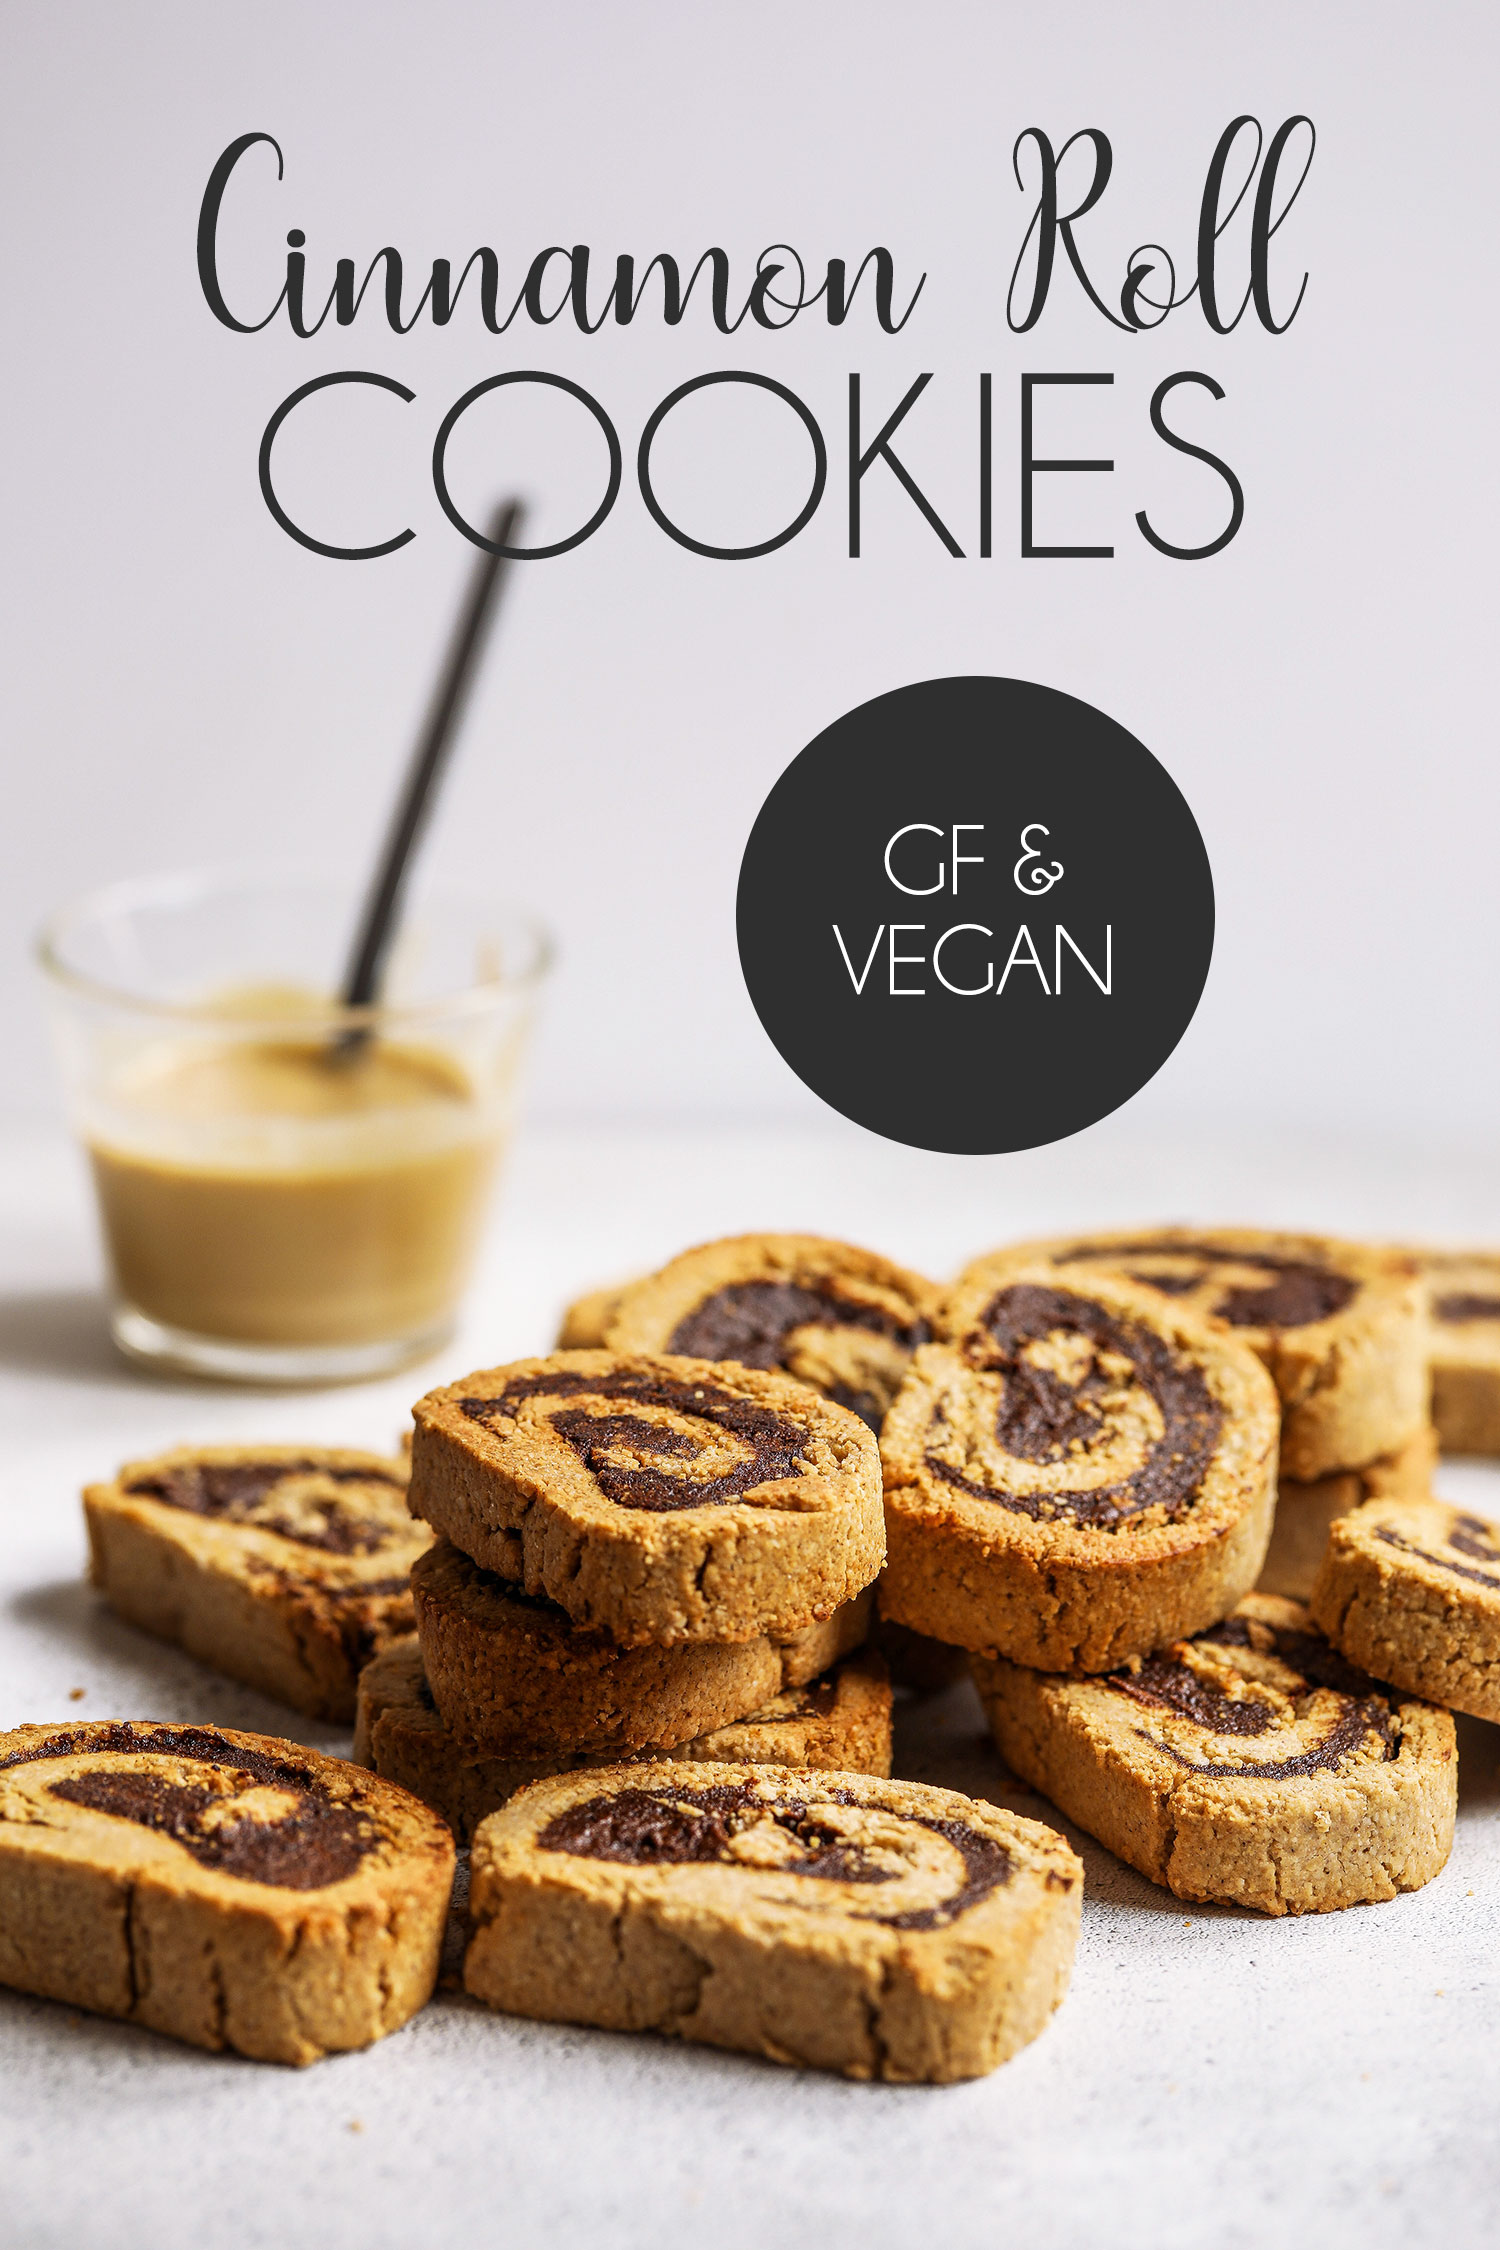 Vegan Gluten-free Cinnamon Roll Cookies